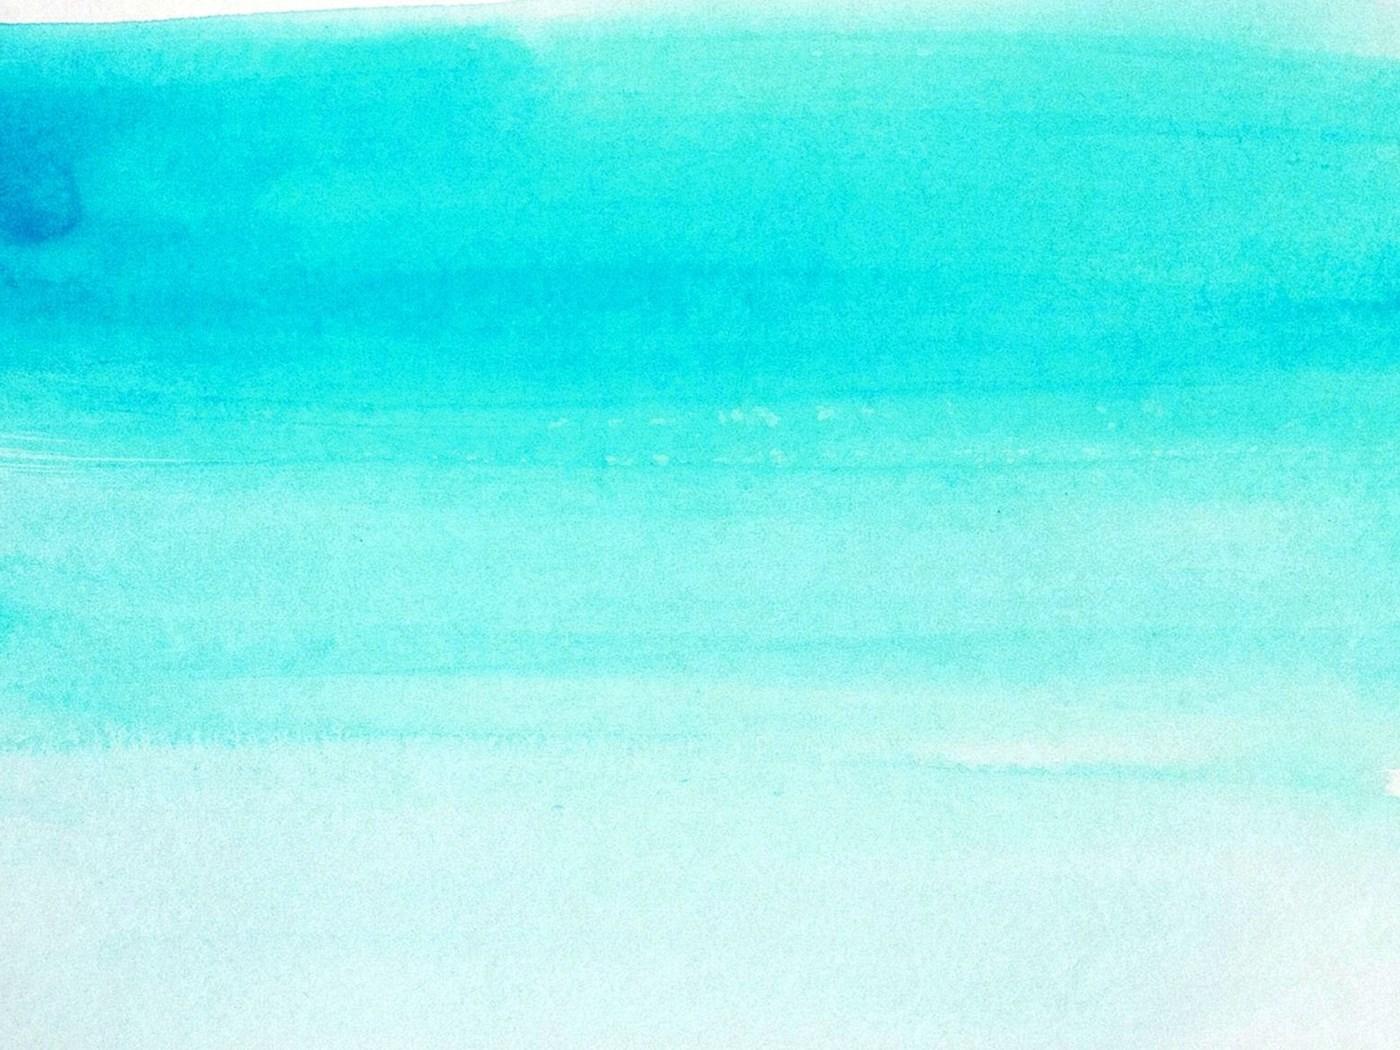 Tiffany Blue Wallpapers Tumblr Kl005 Desktop Background